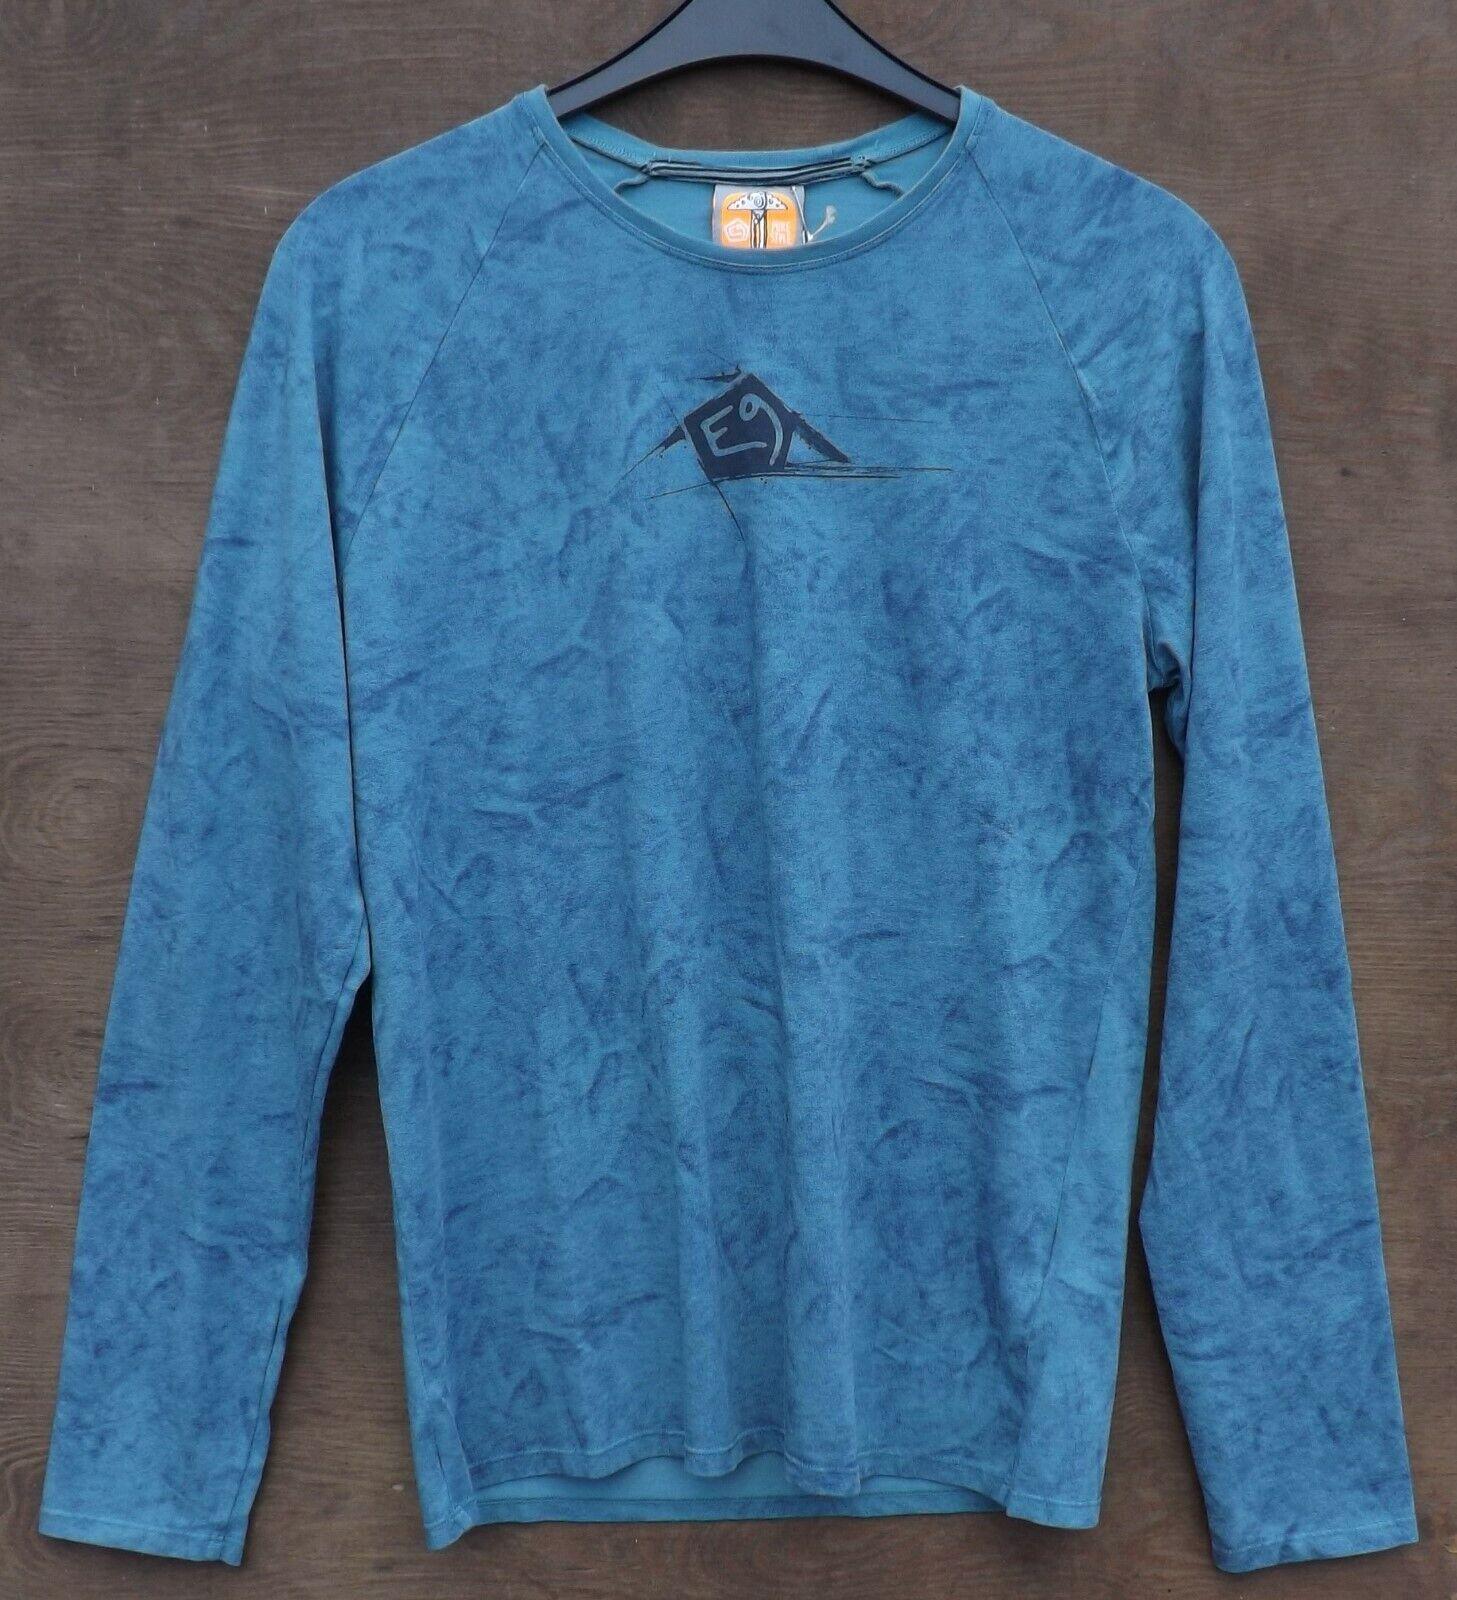 E9 Leo Longsleeve Tee  Men Long Sleeve Mens Shirt Dust  enjoy 50% off